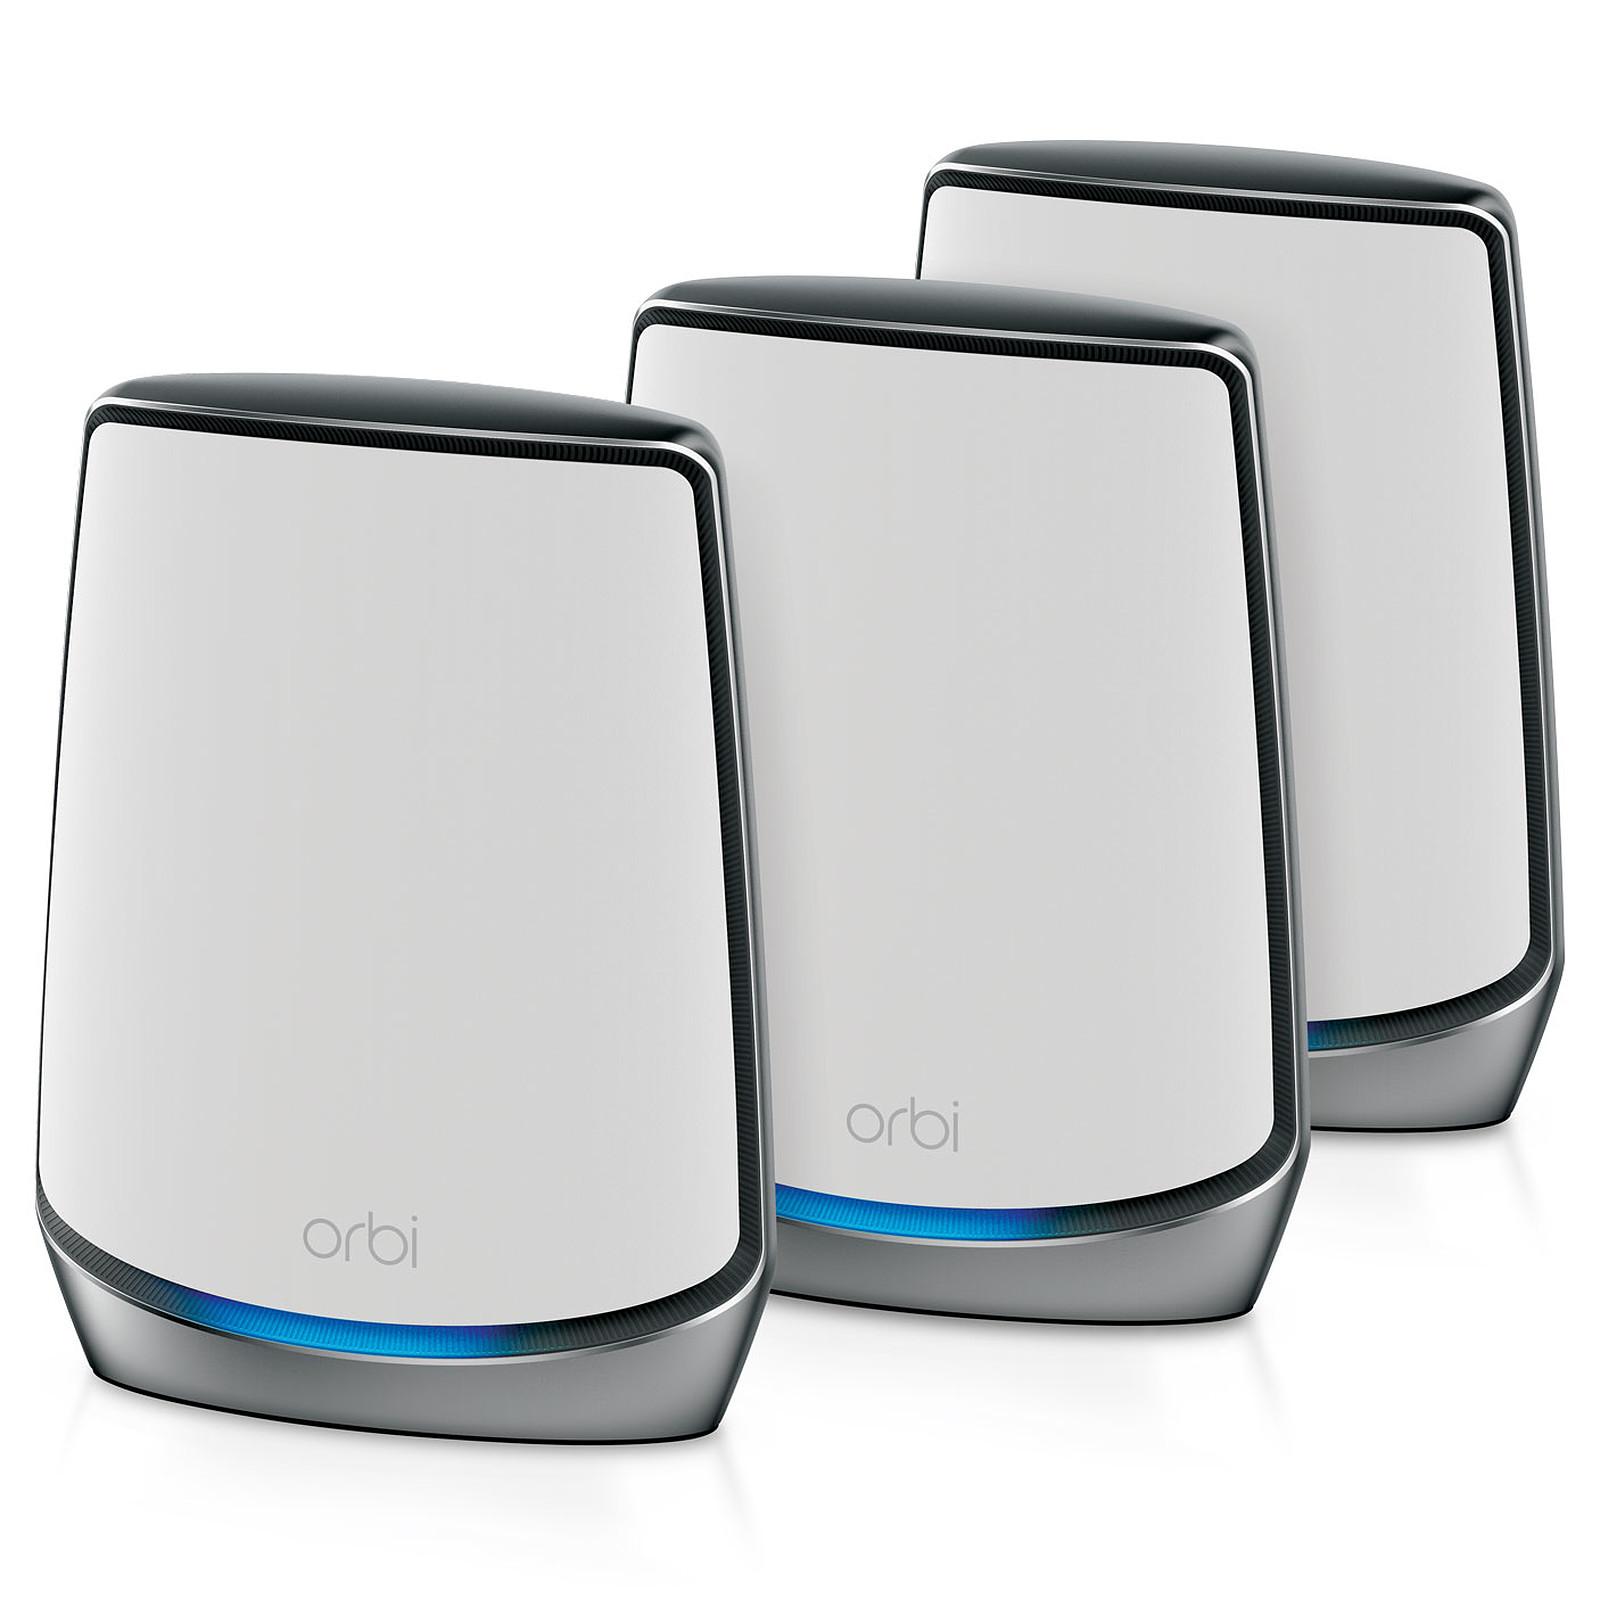 Netgear Orbi WiFi 6 AX6000 routeur + 2 satellites (RBK853)